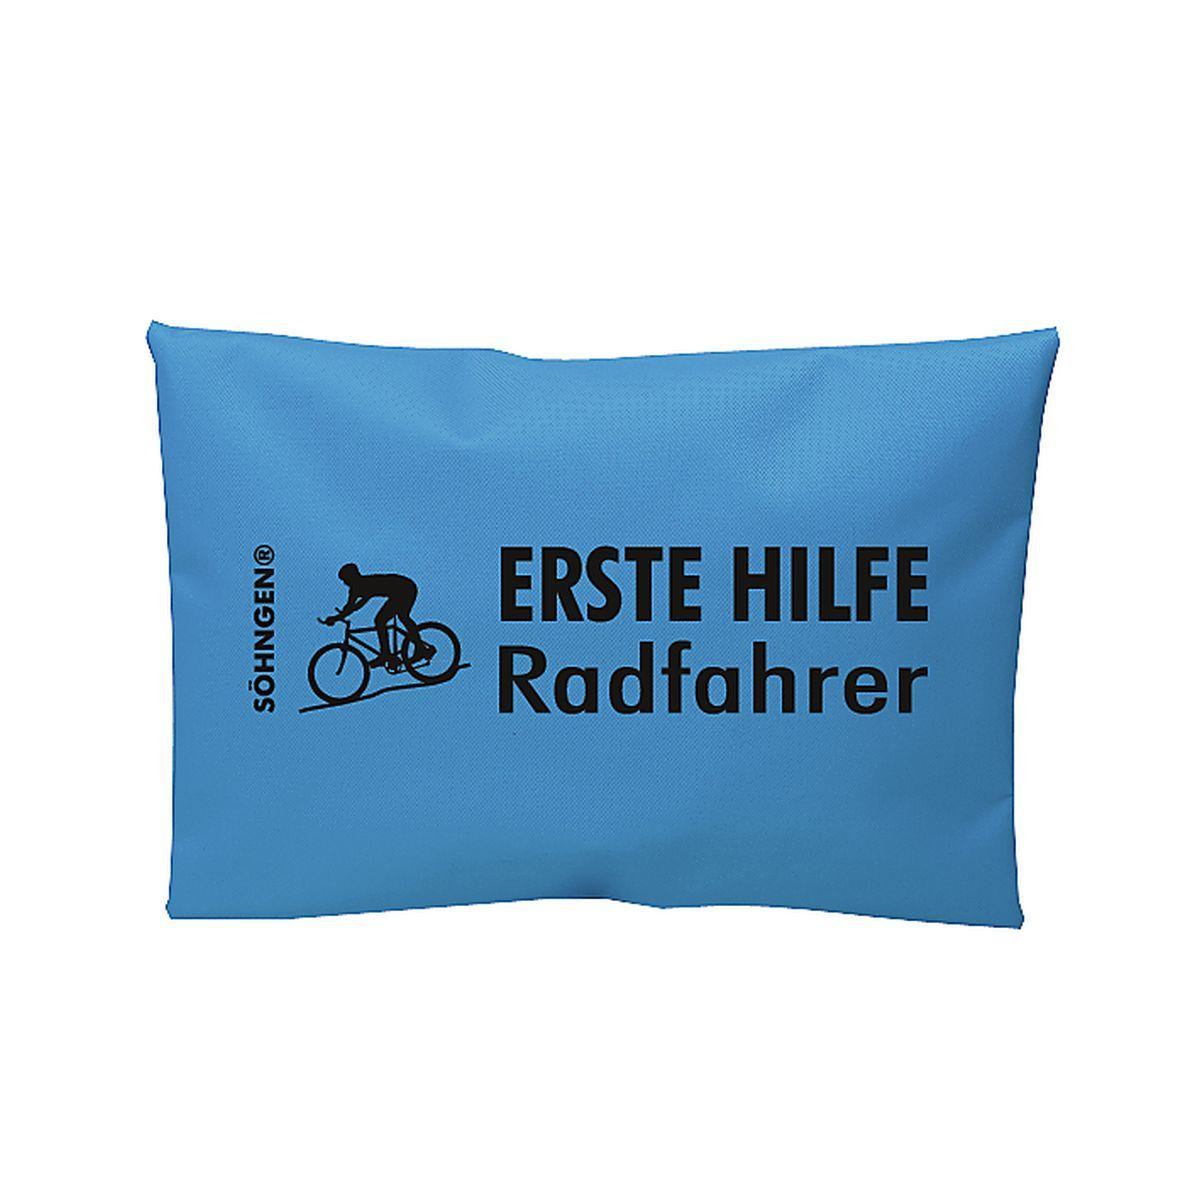 Erste Hilfe Radfahrer blau